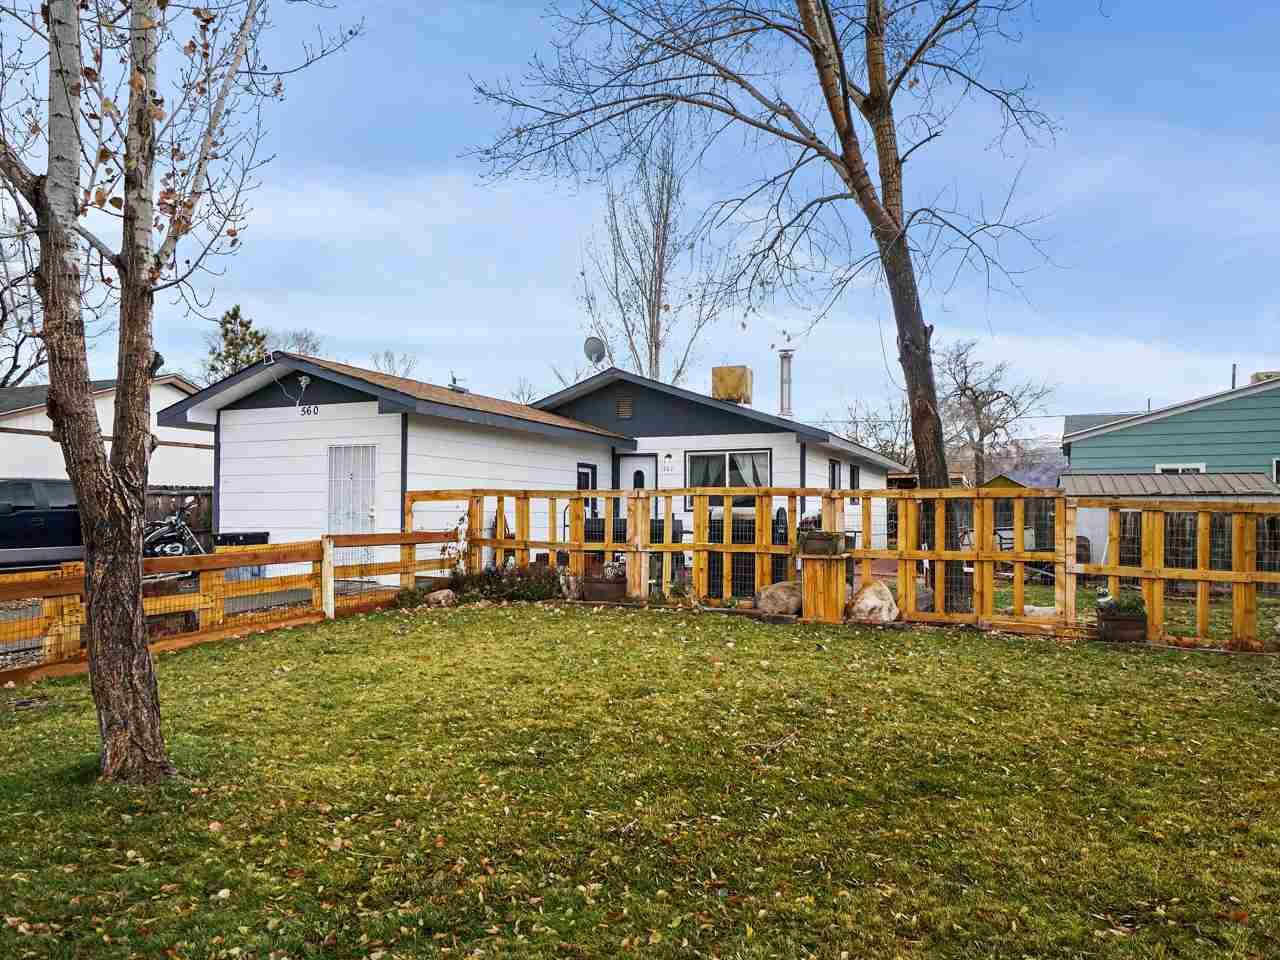 560 W Pabor Way Property Photo - Fruita, CO real estate listing